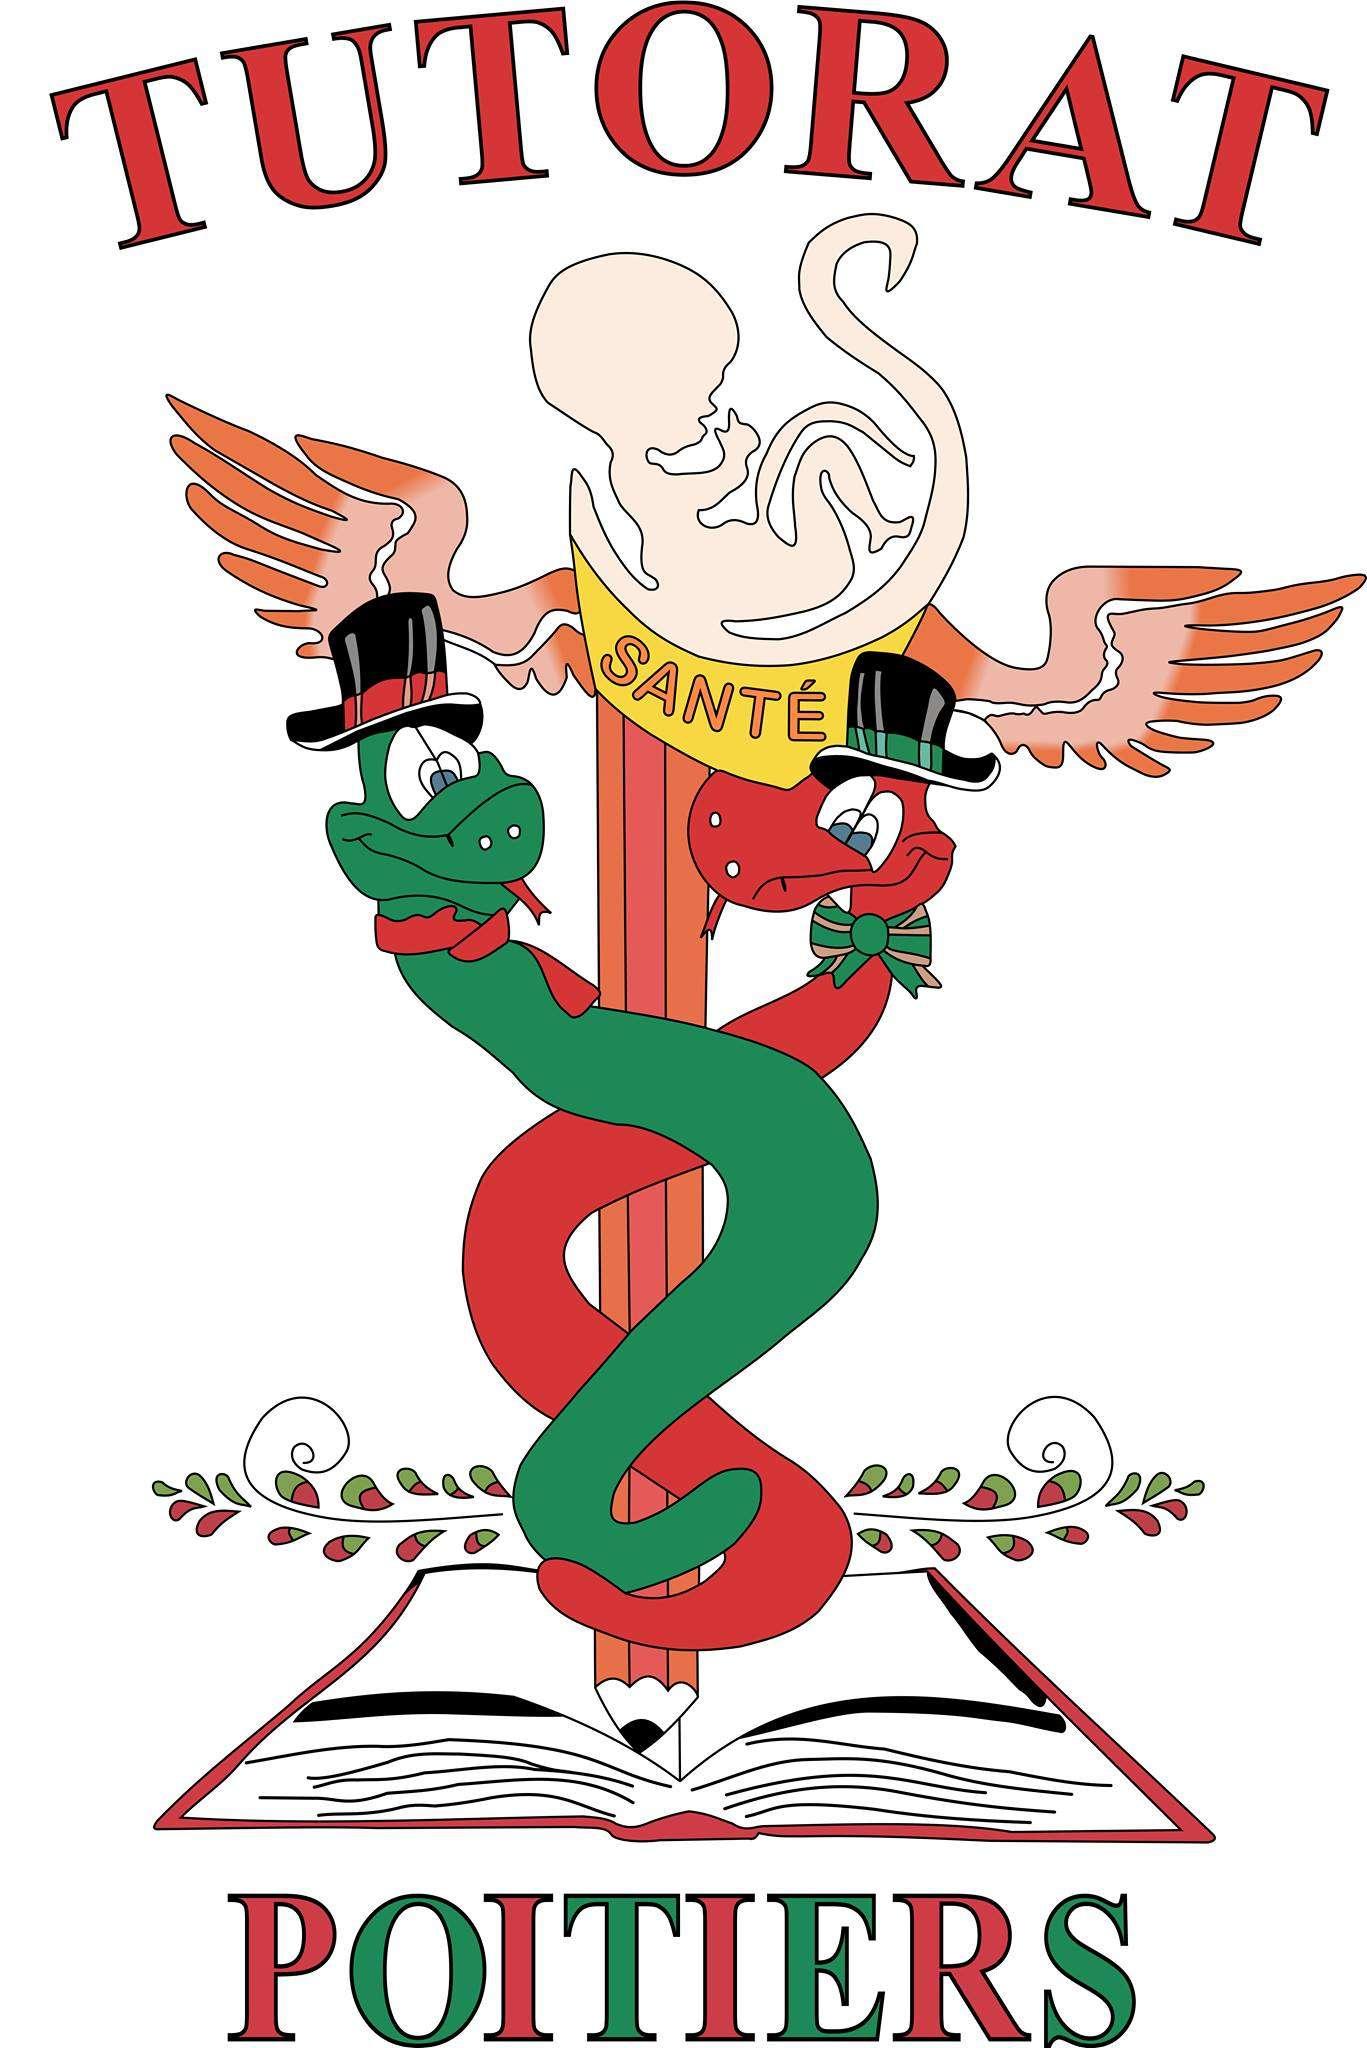 Logo du Tutorat de Poitiers